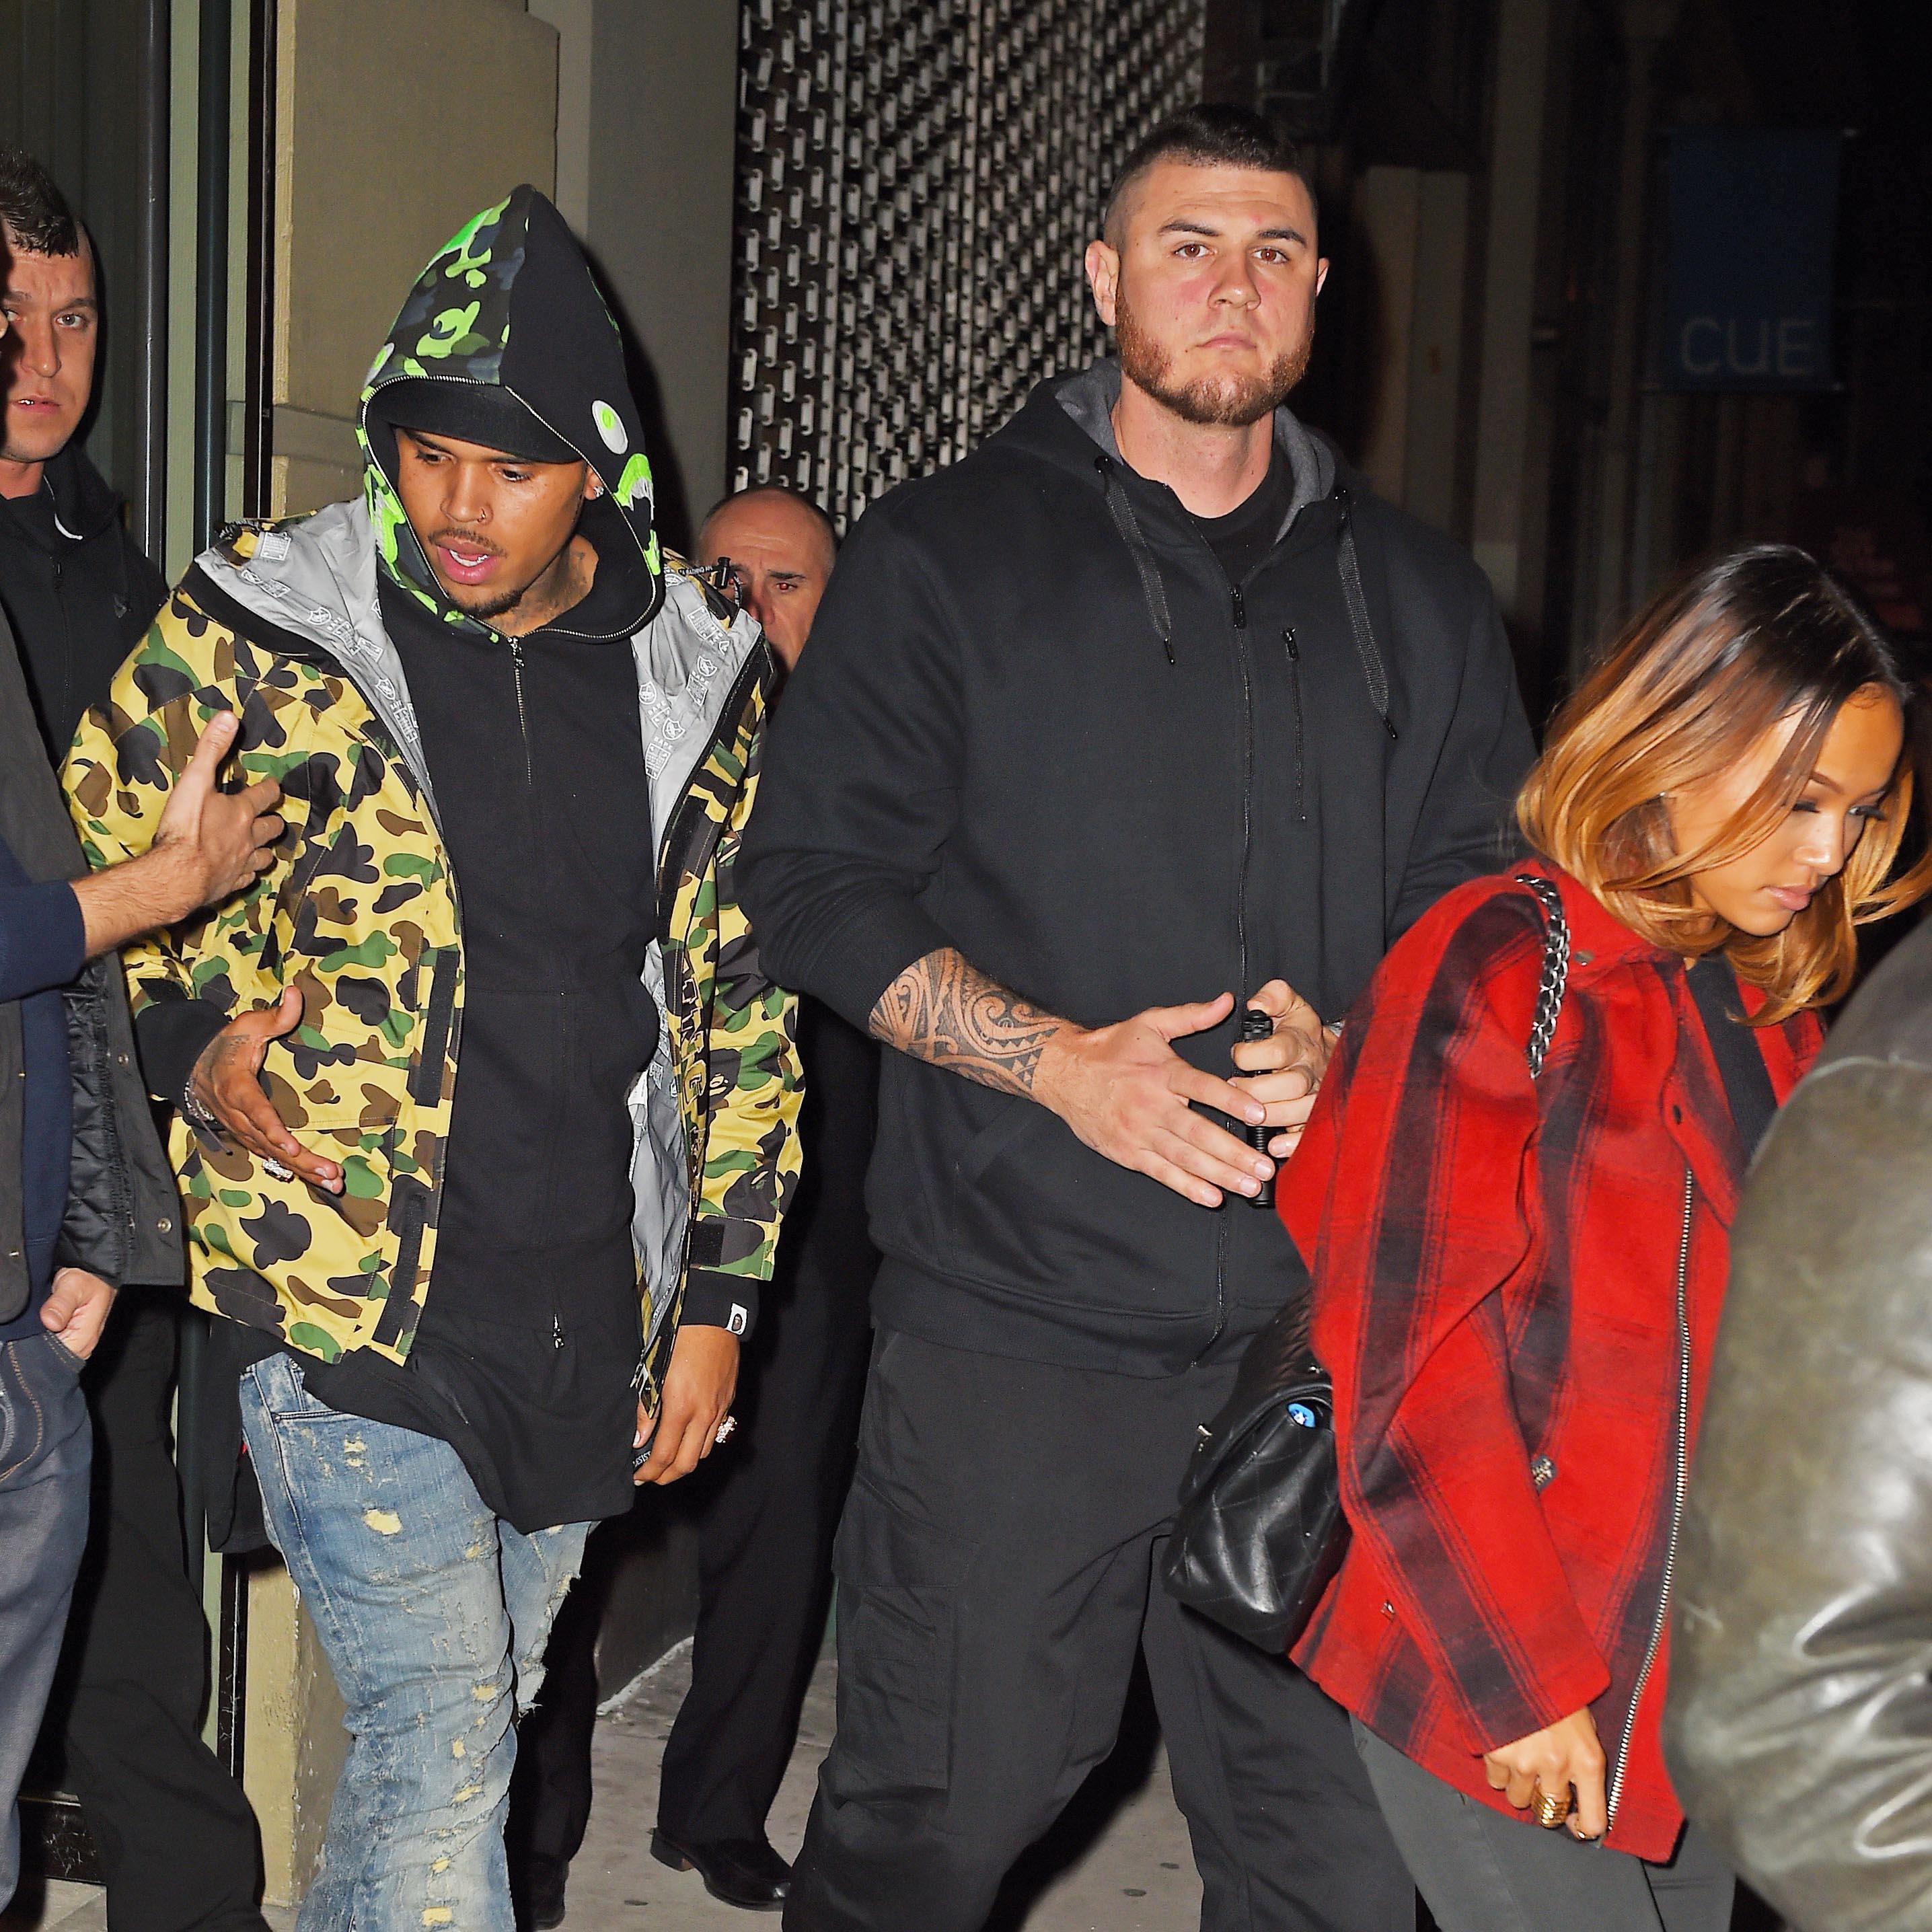 Chris Brown and girlfriend Karrueche Tran seen leaving an art gallery in Chelsea